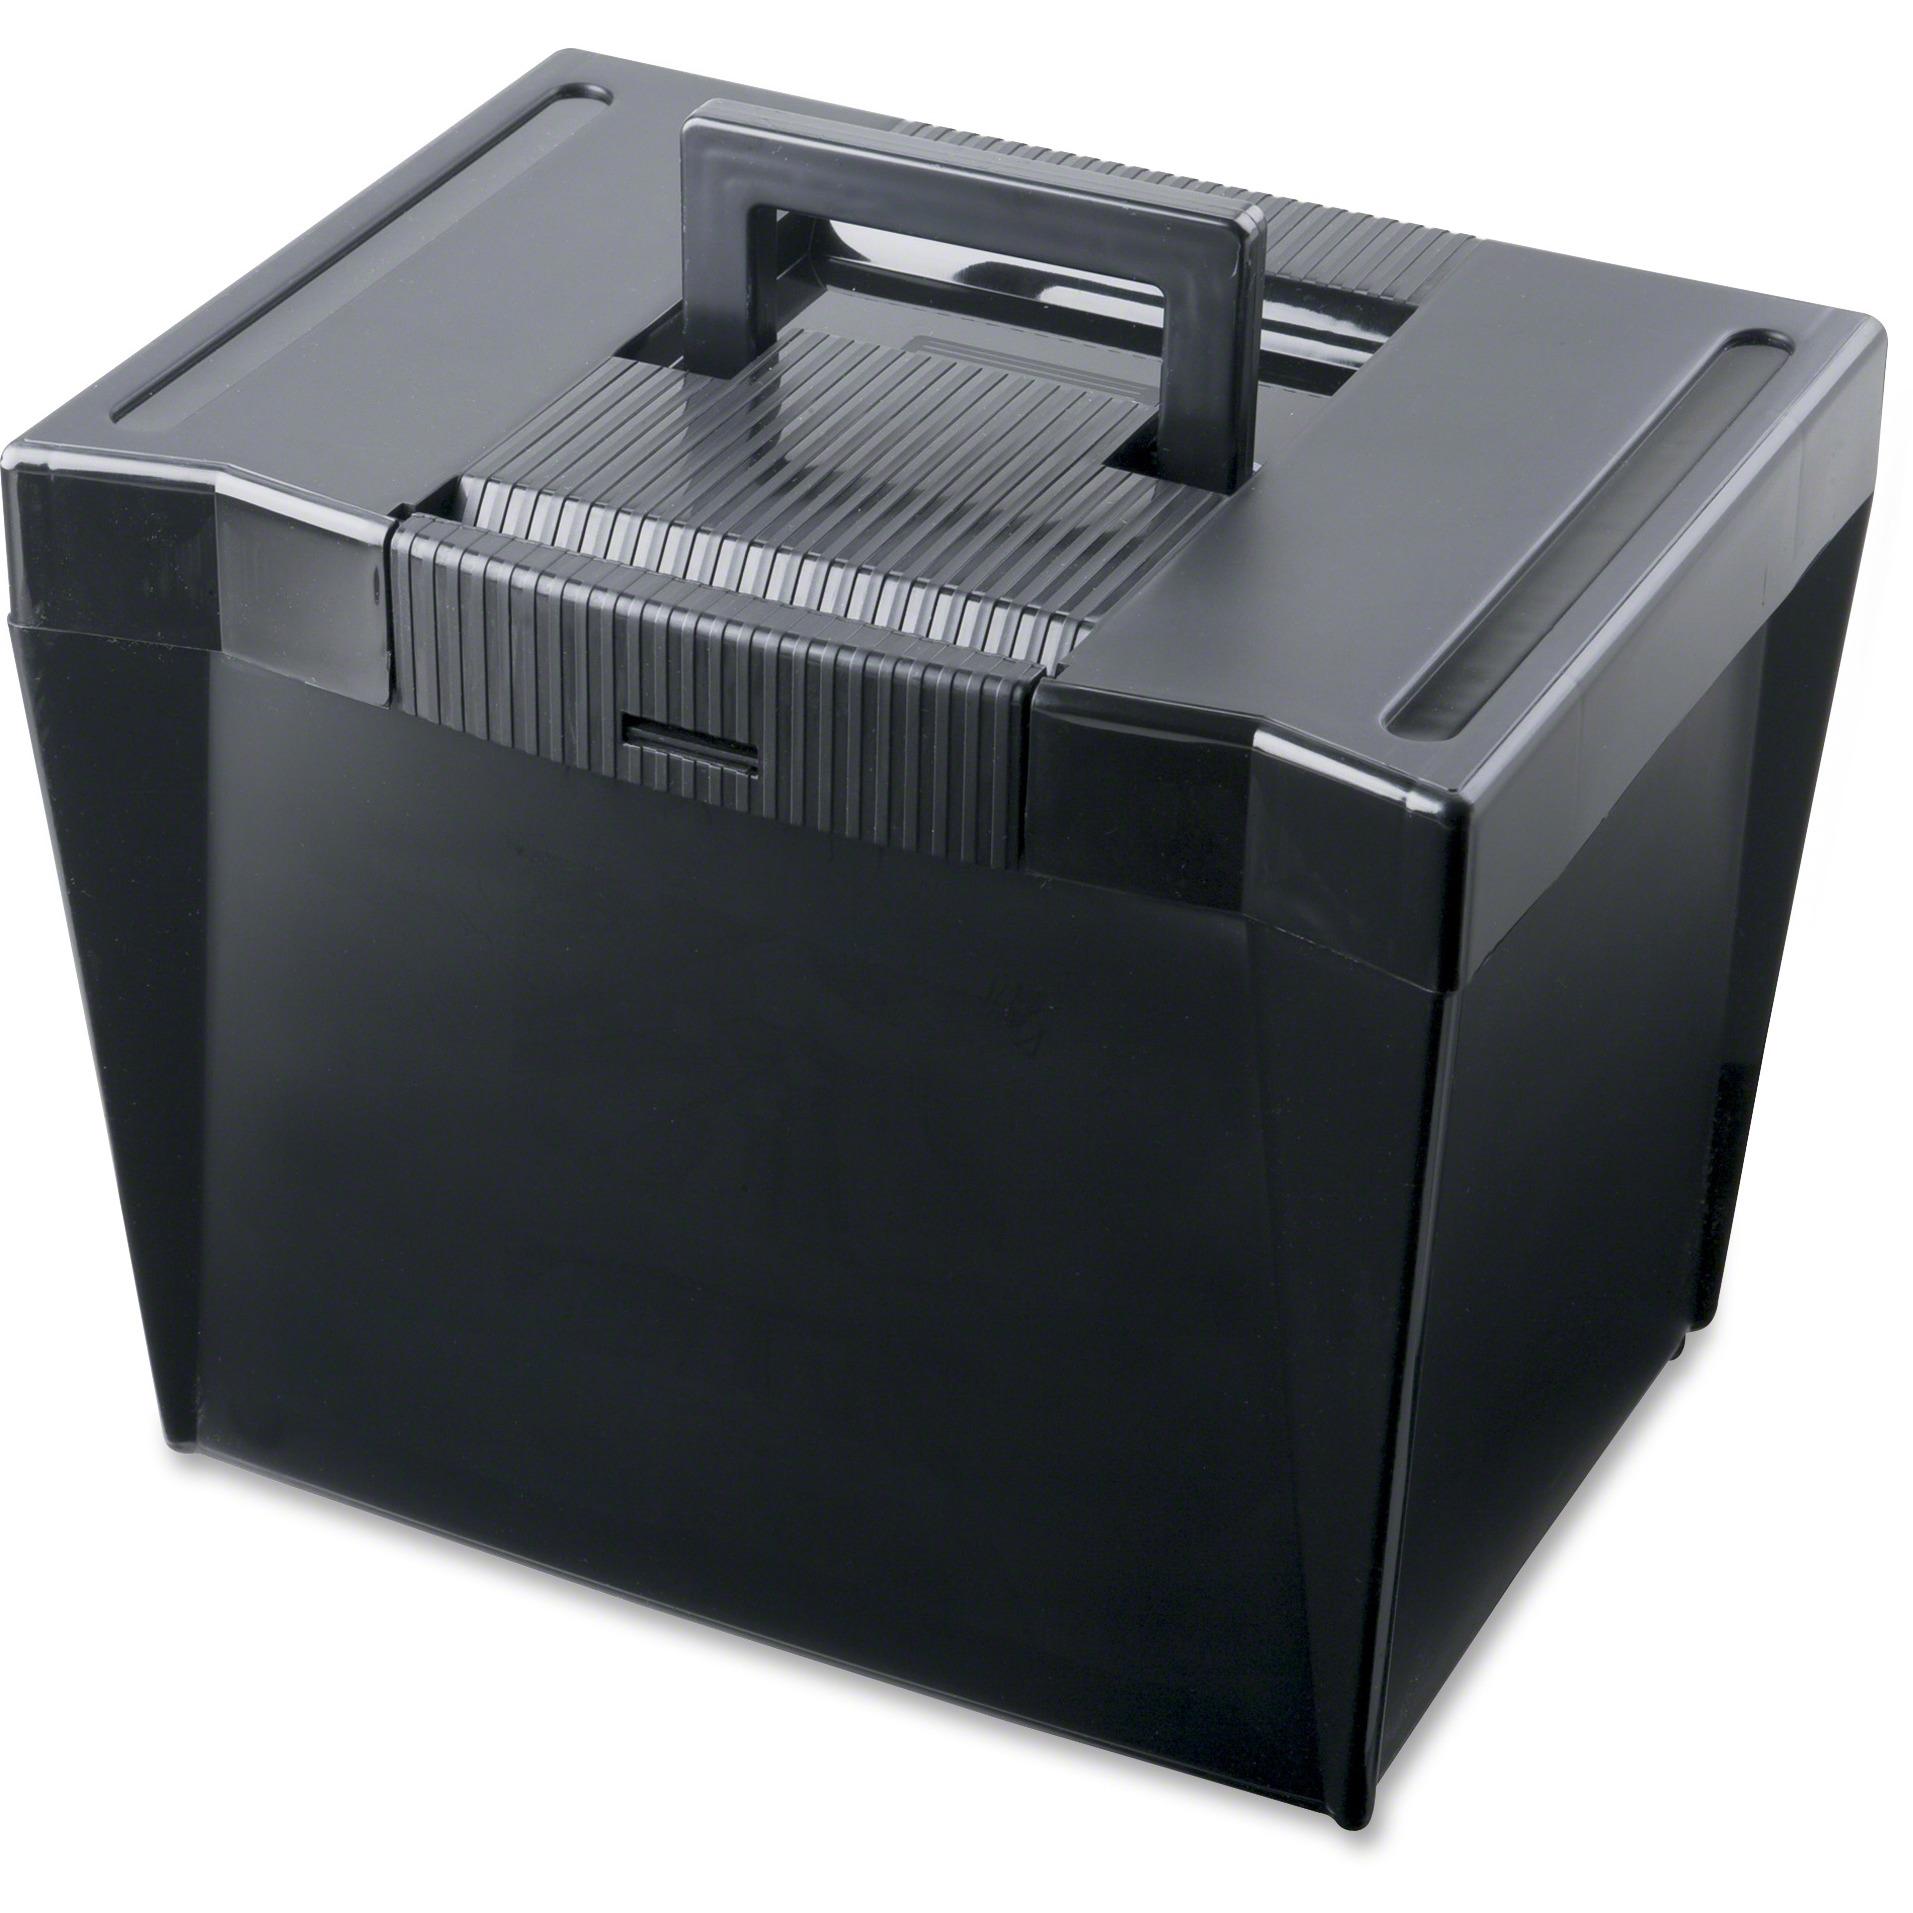 Portable File Storage Box, Letter, Plastic, 13 1/2 x 10 1/4 x 10 7/8, Black